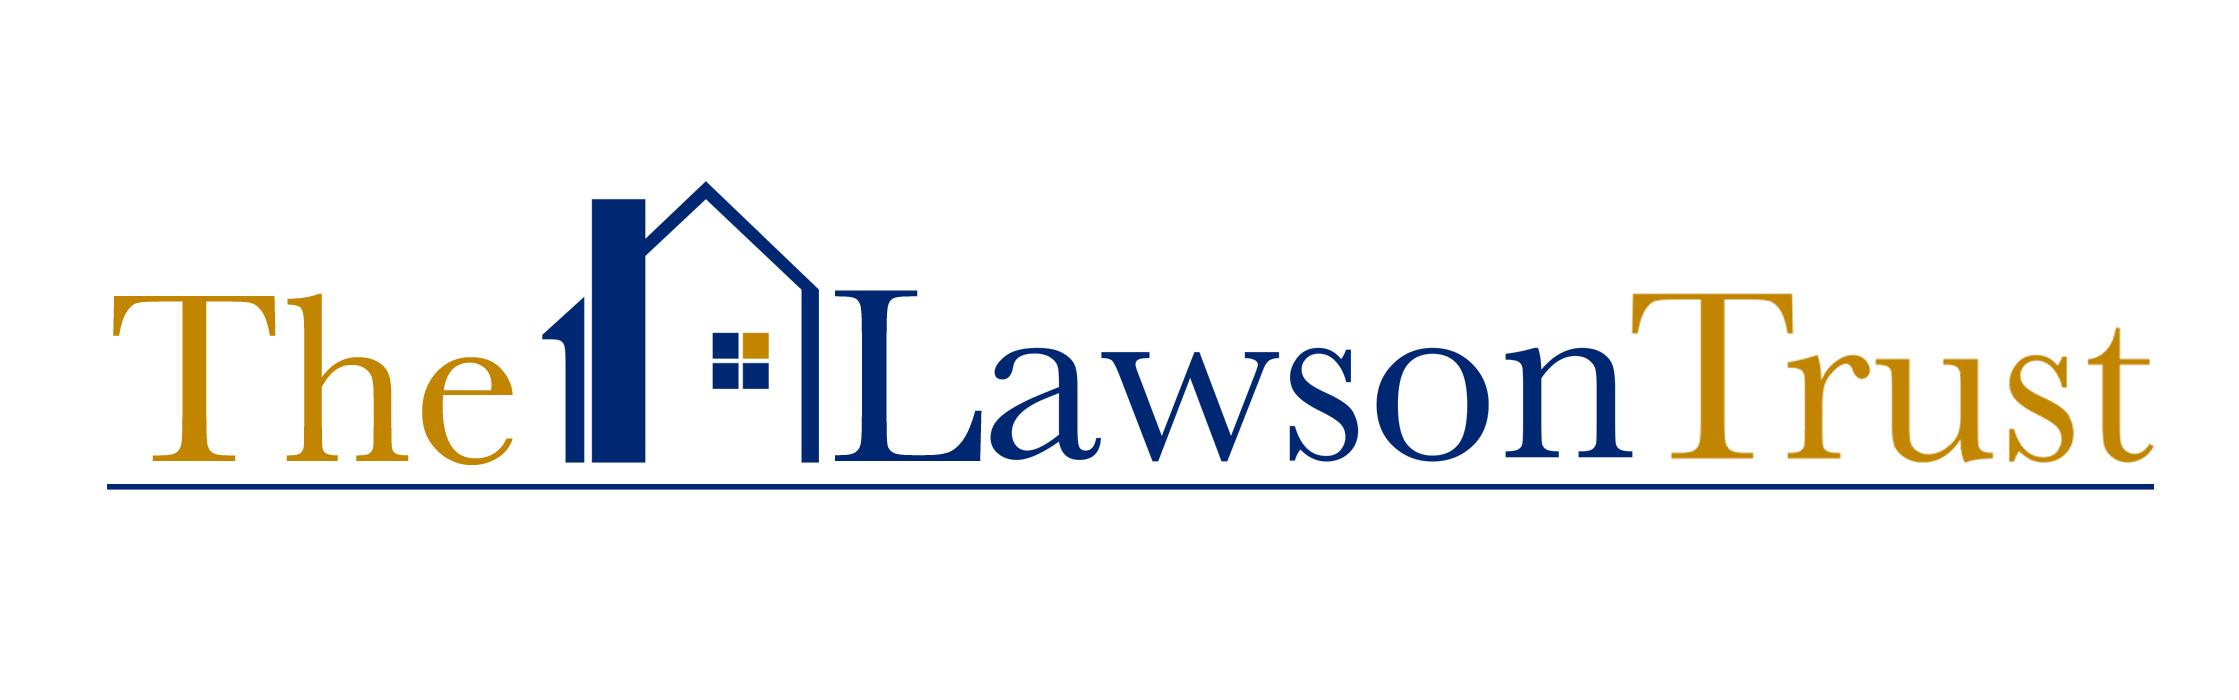 Lawson trust.png